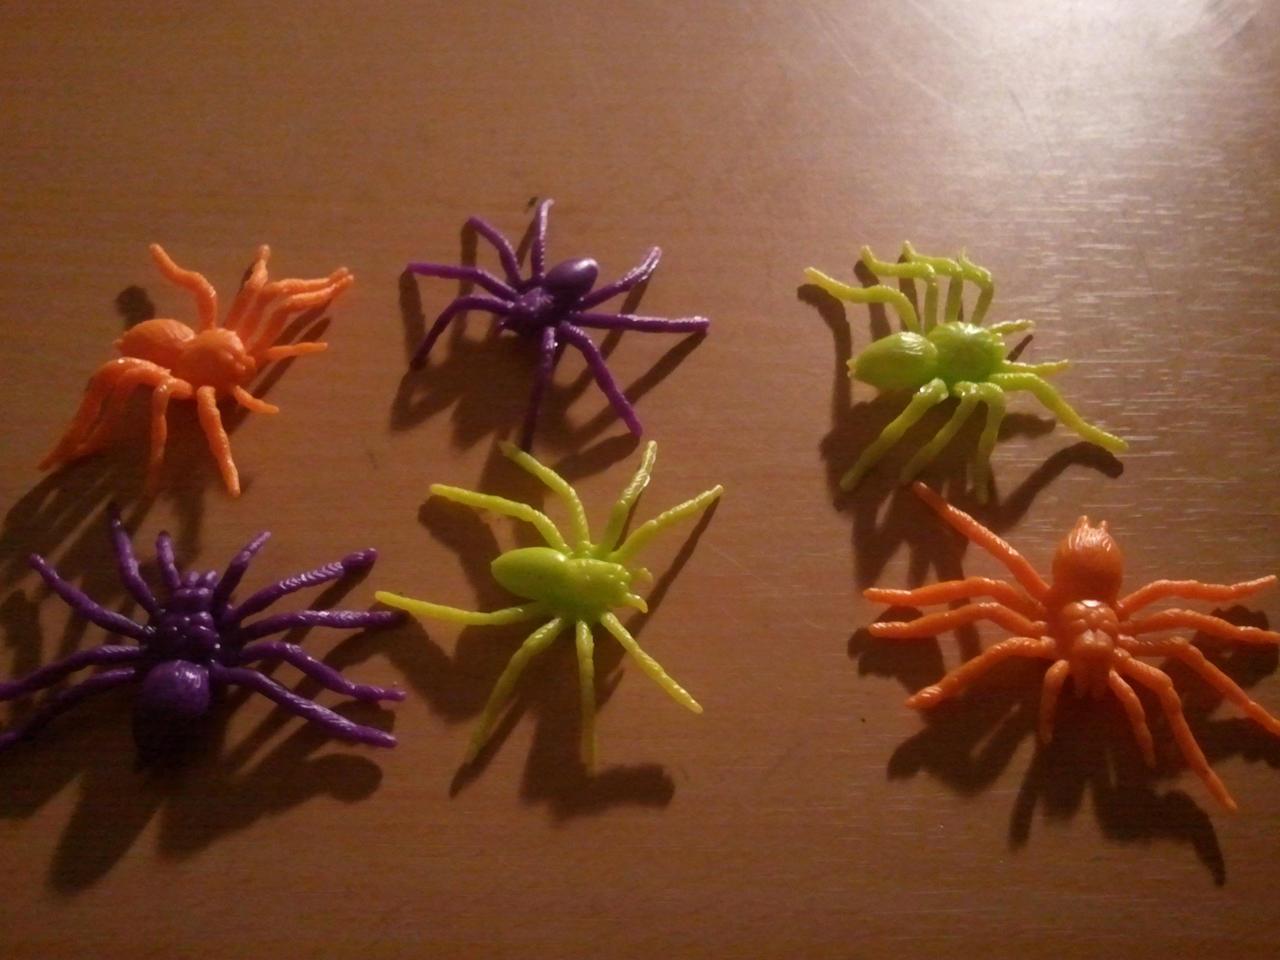 Neon Colored Spiders by BenorianHardback26